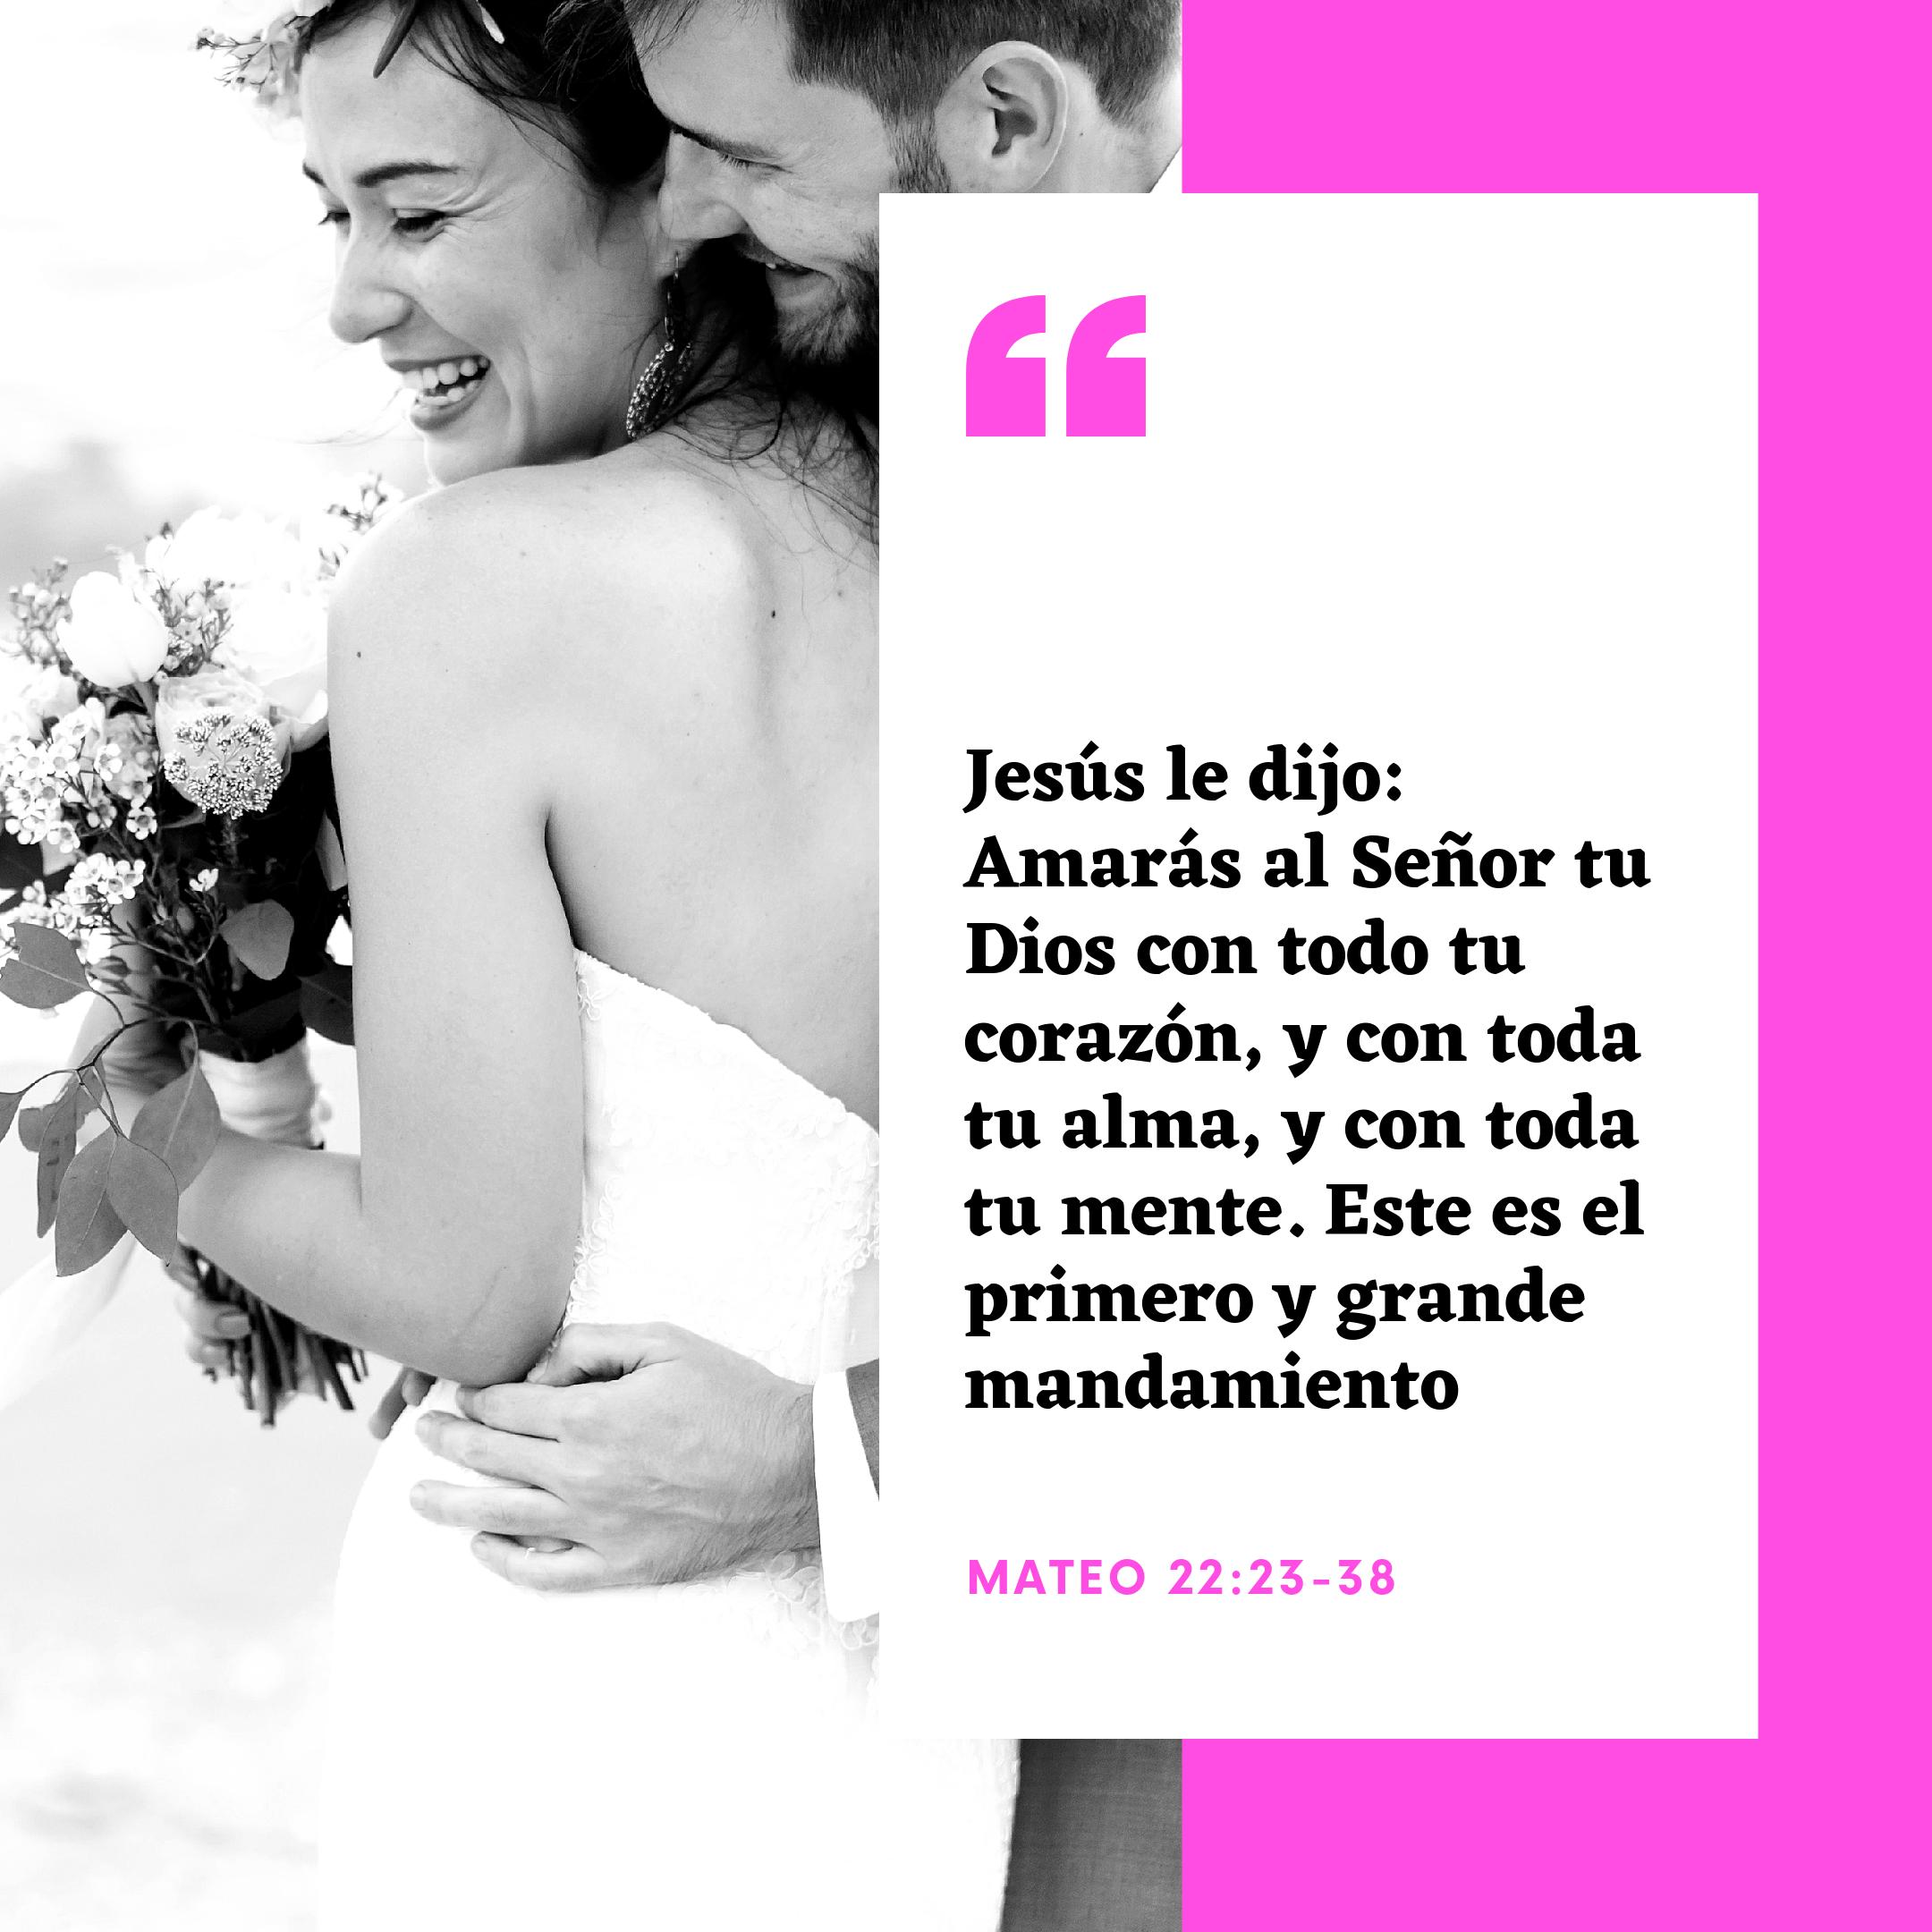 Imágenes Cristianas Frases Matrimonio Pareja